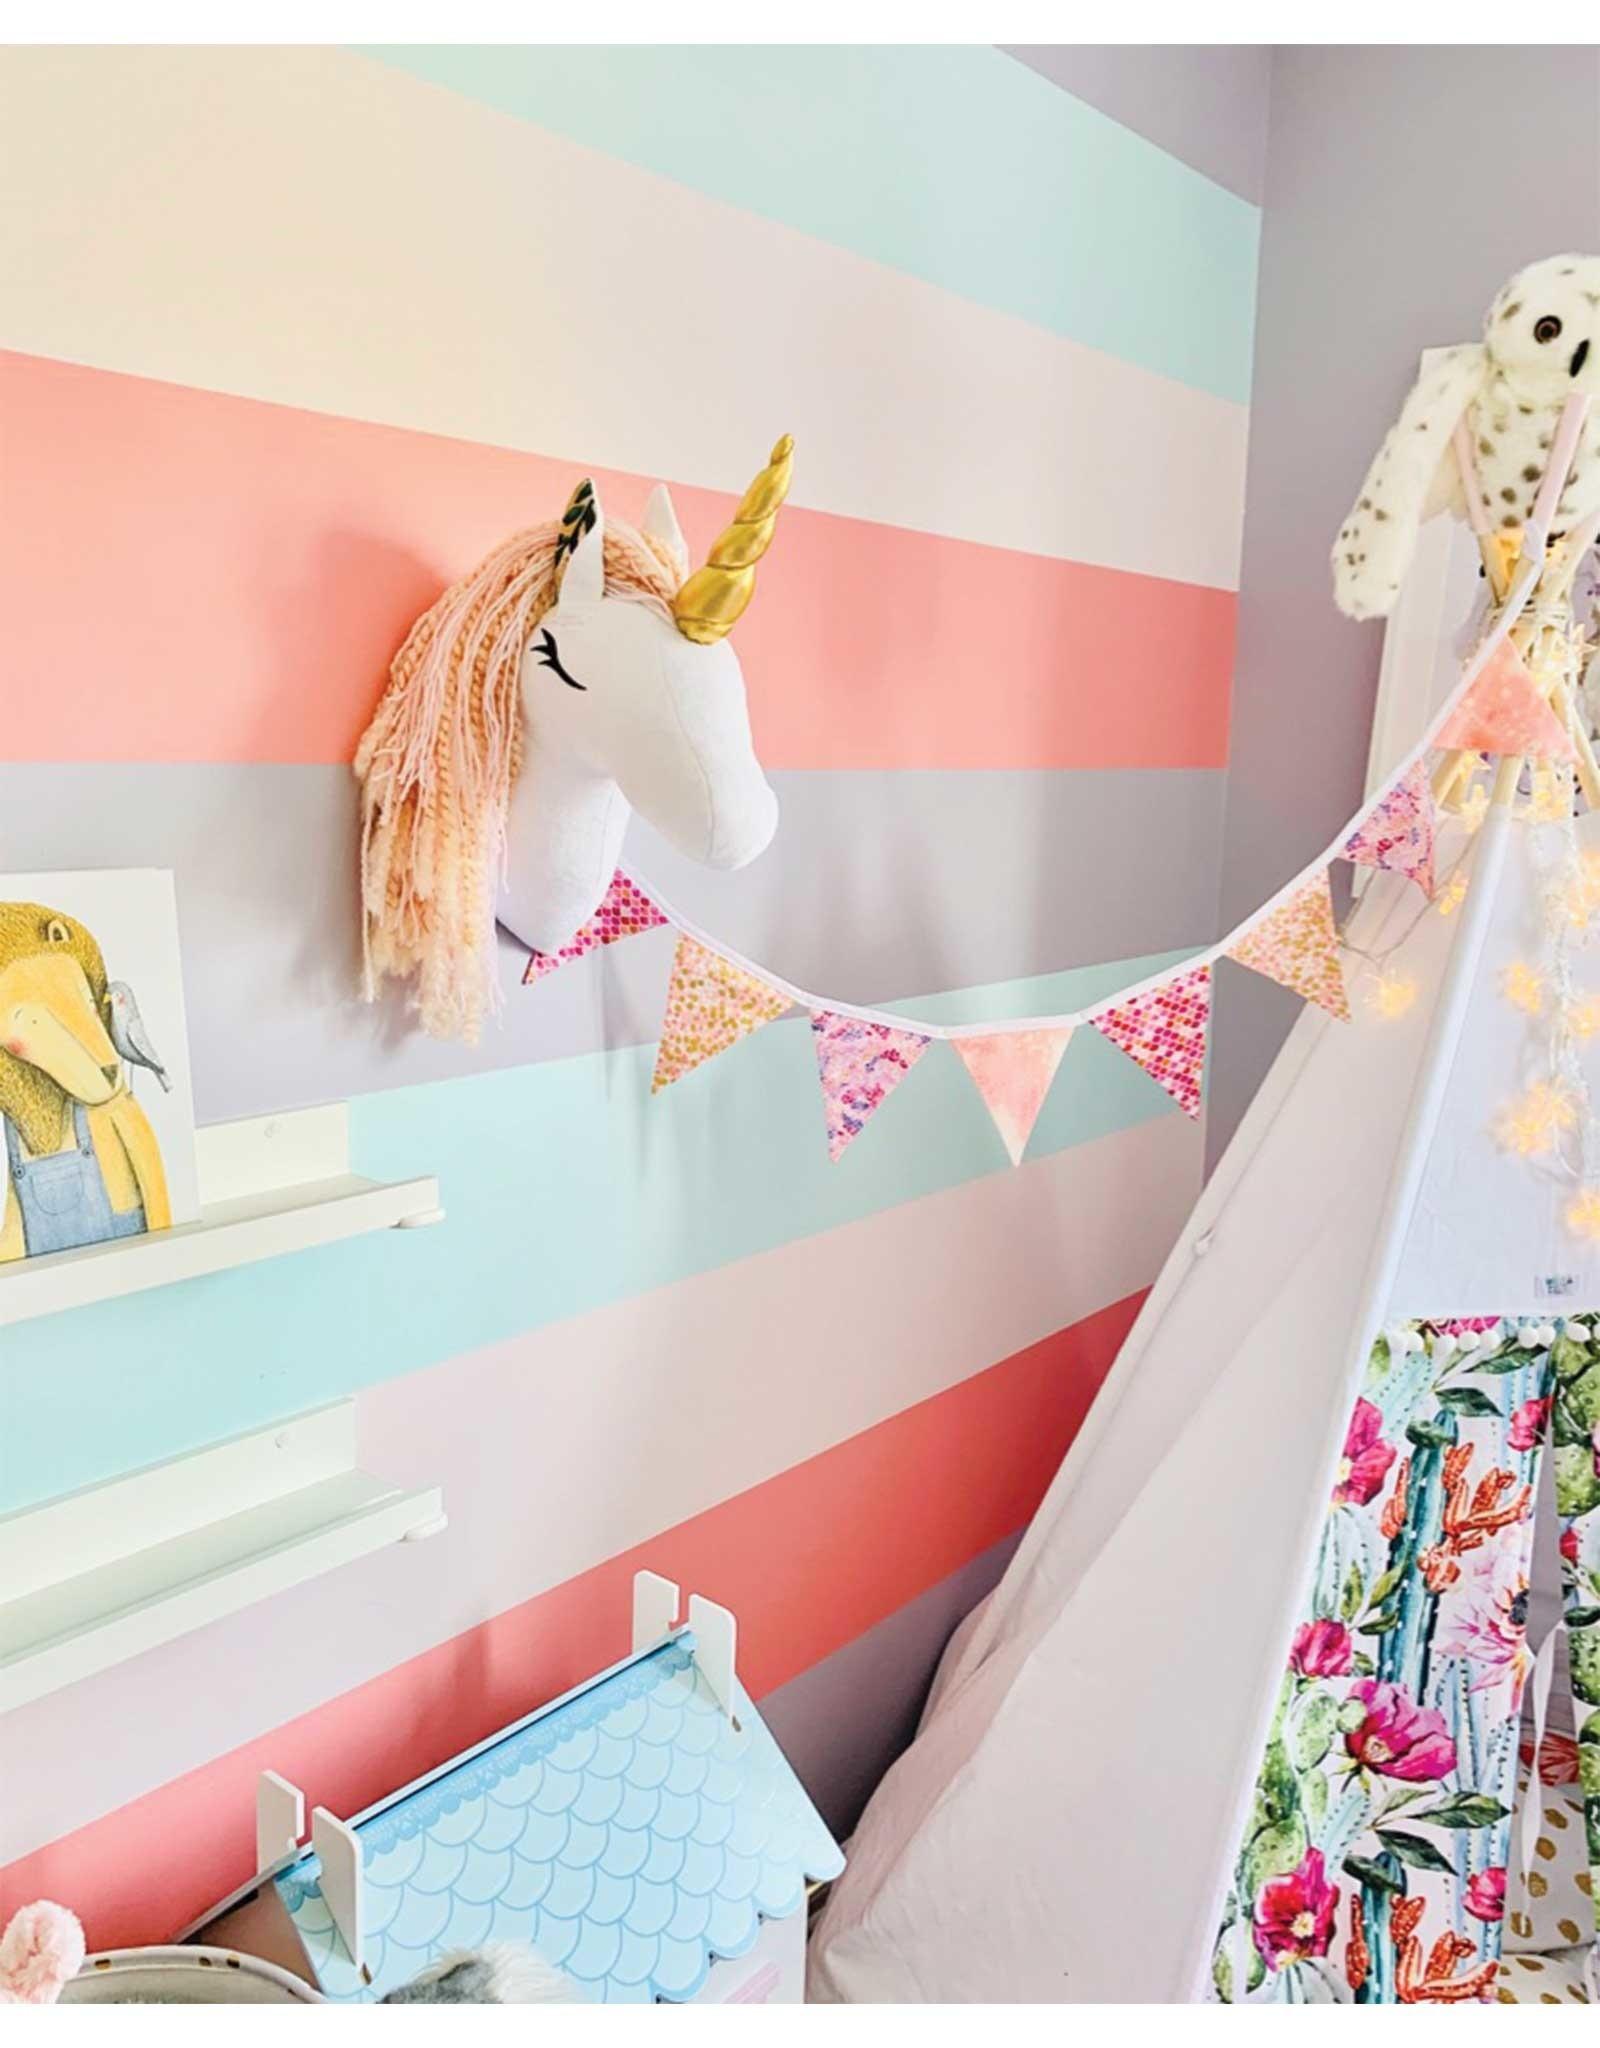 La petite renarde Wall Decoration - Pink Unicorn Colored Flowers